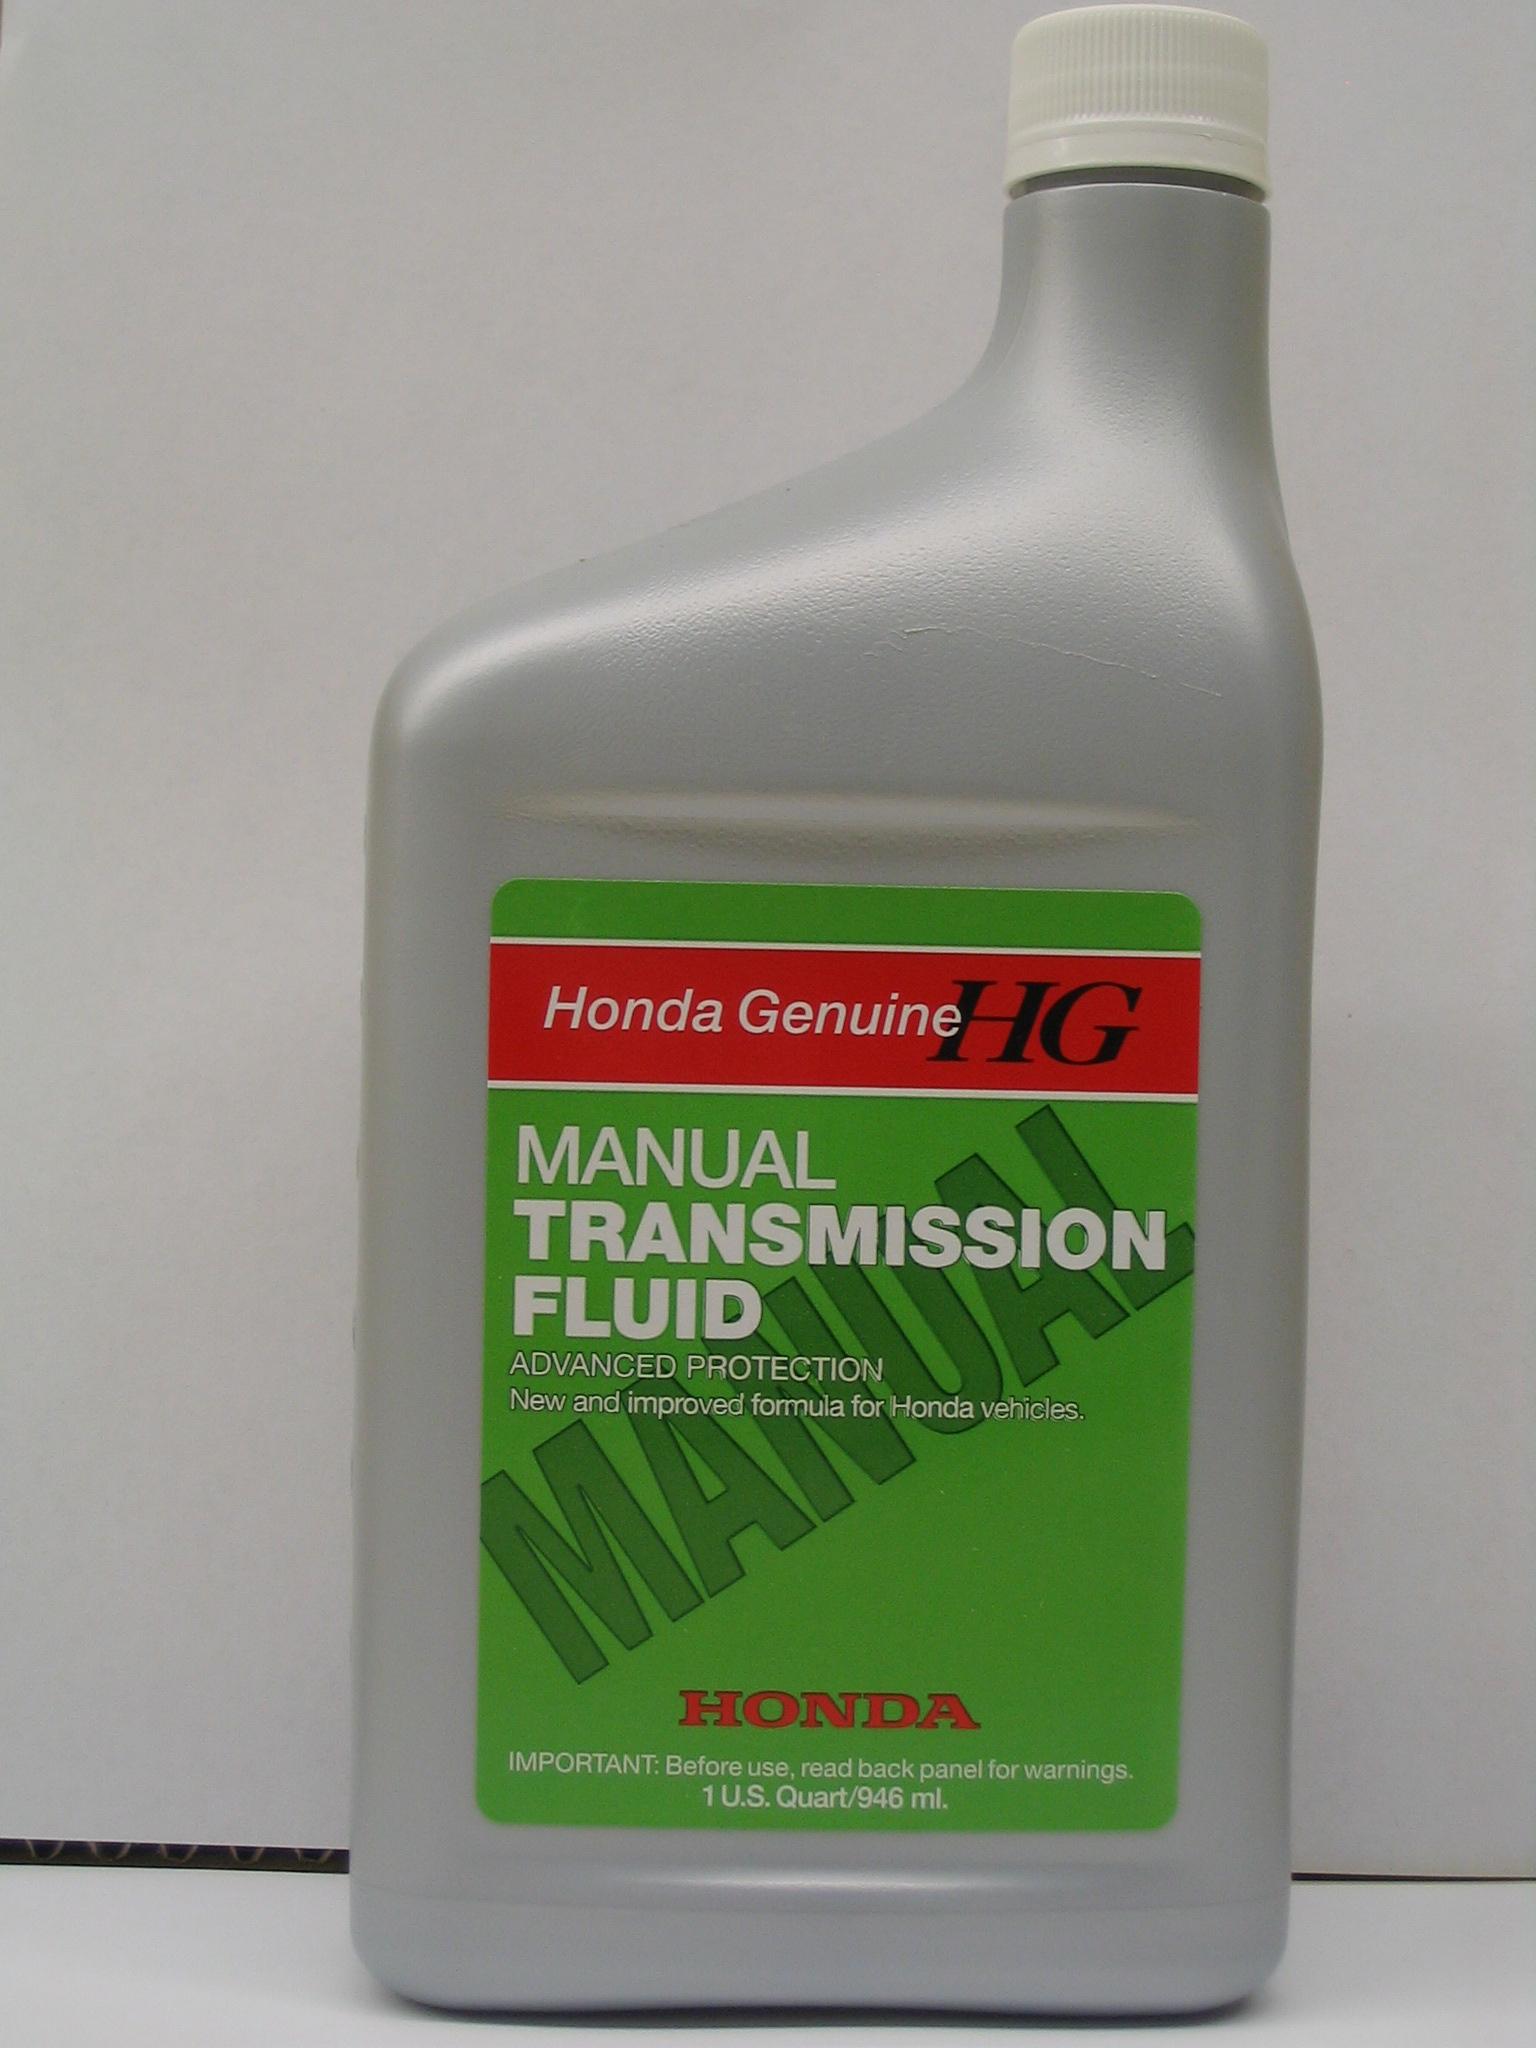 manual transmission fluid honda parts at hondapartsdeals com honda rh hondapartsdeals com automatic transmission fluid for 2001 honda accord automatic transmission fluid for 2009 honda accord